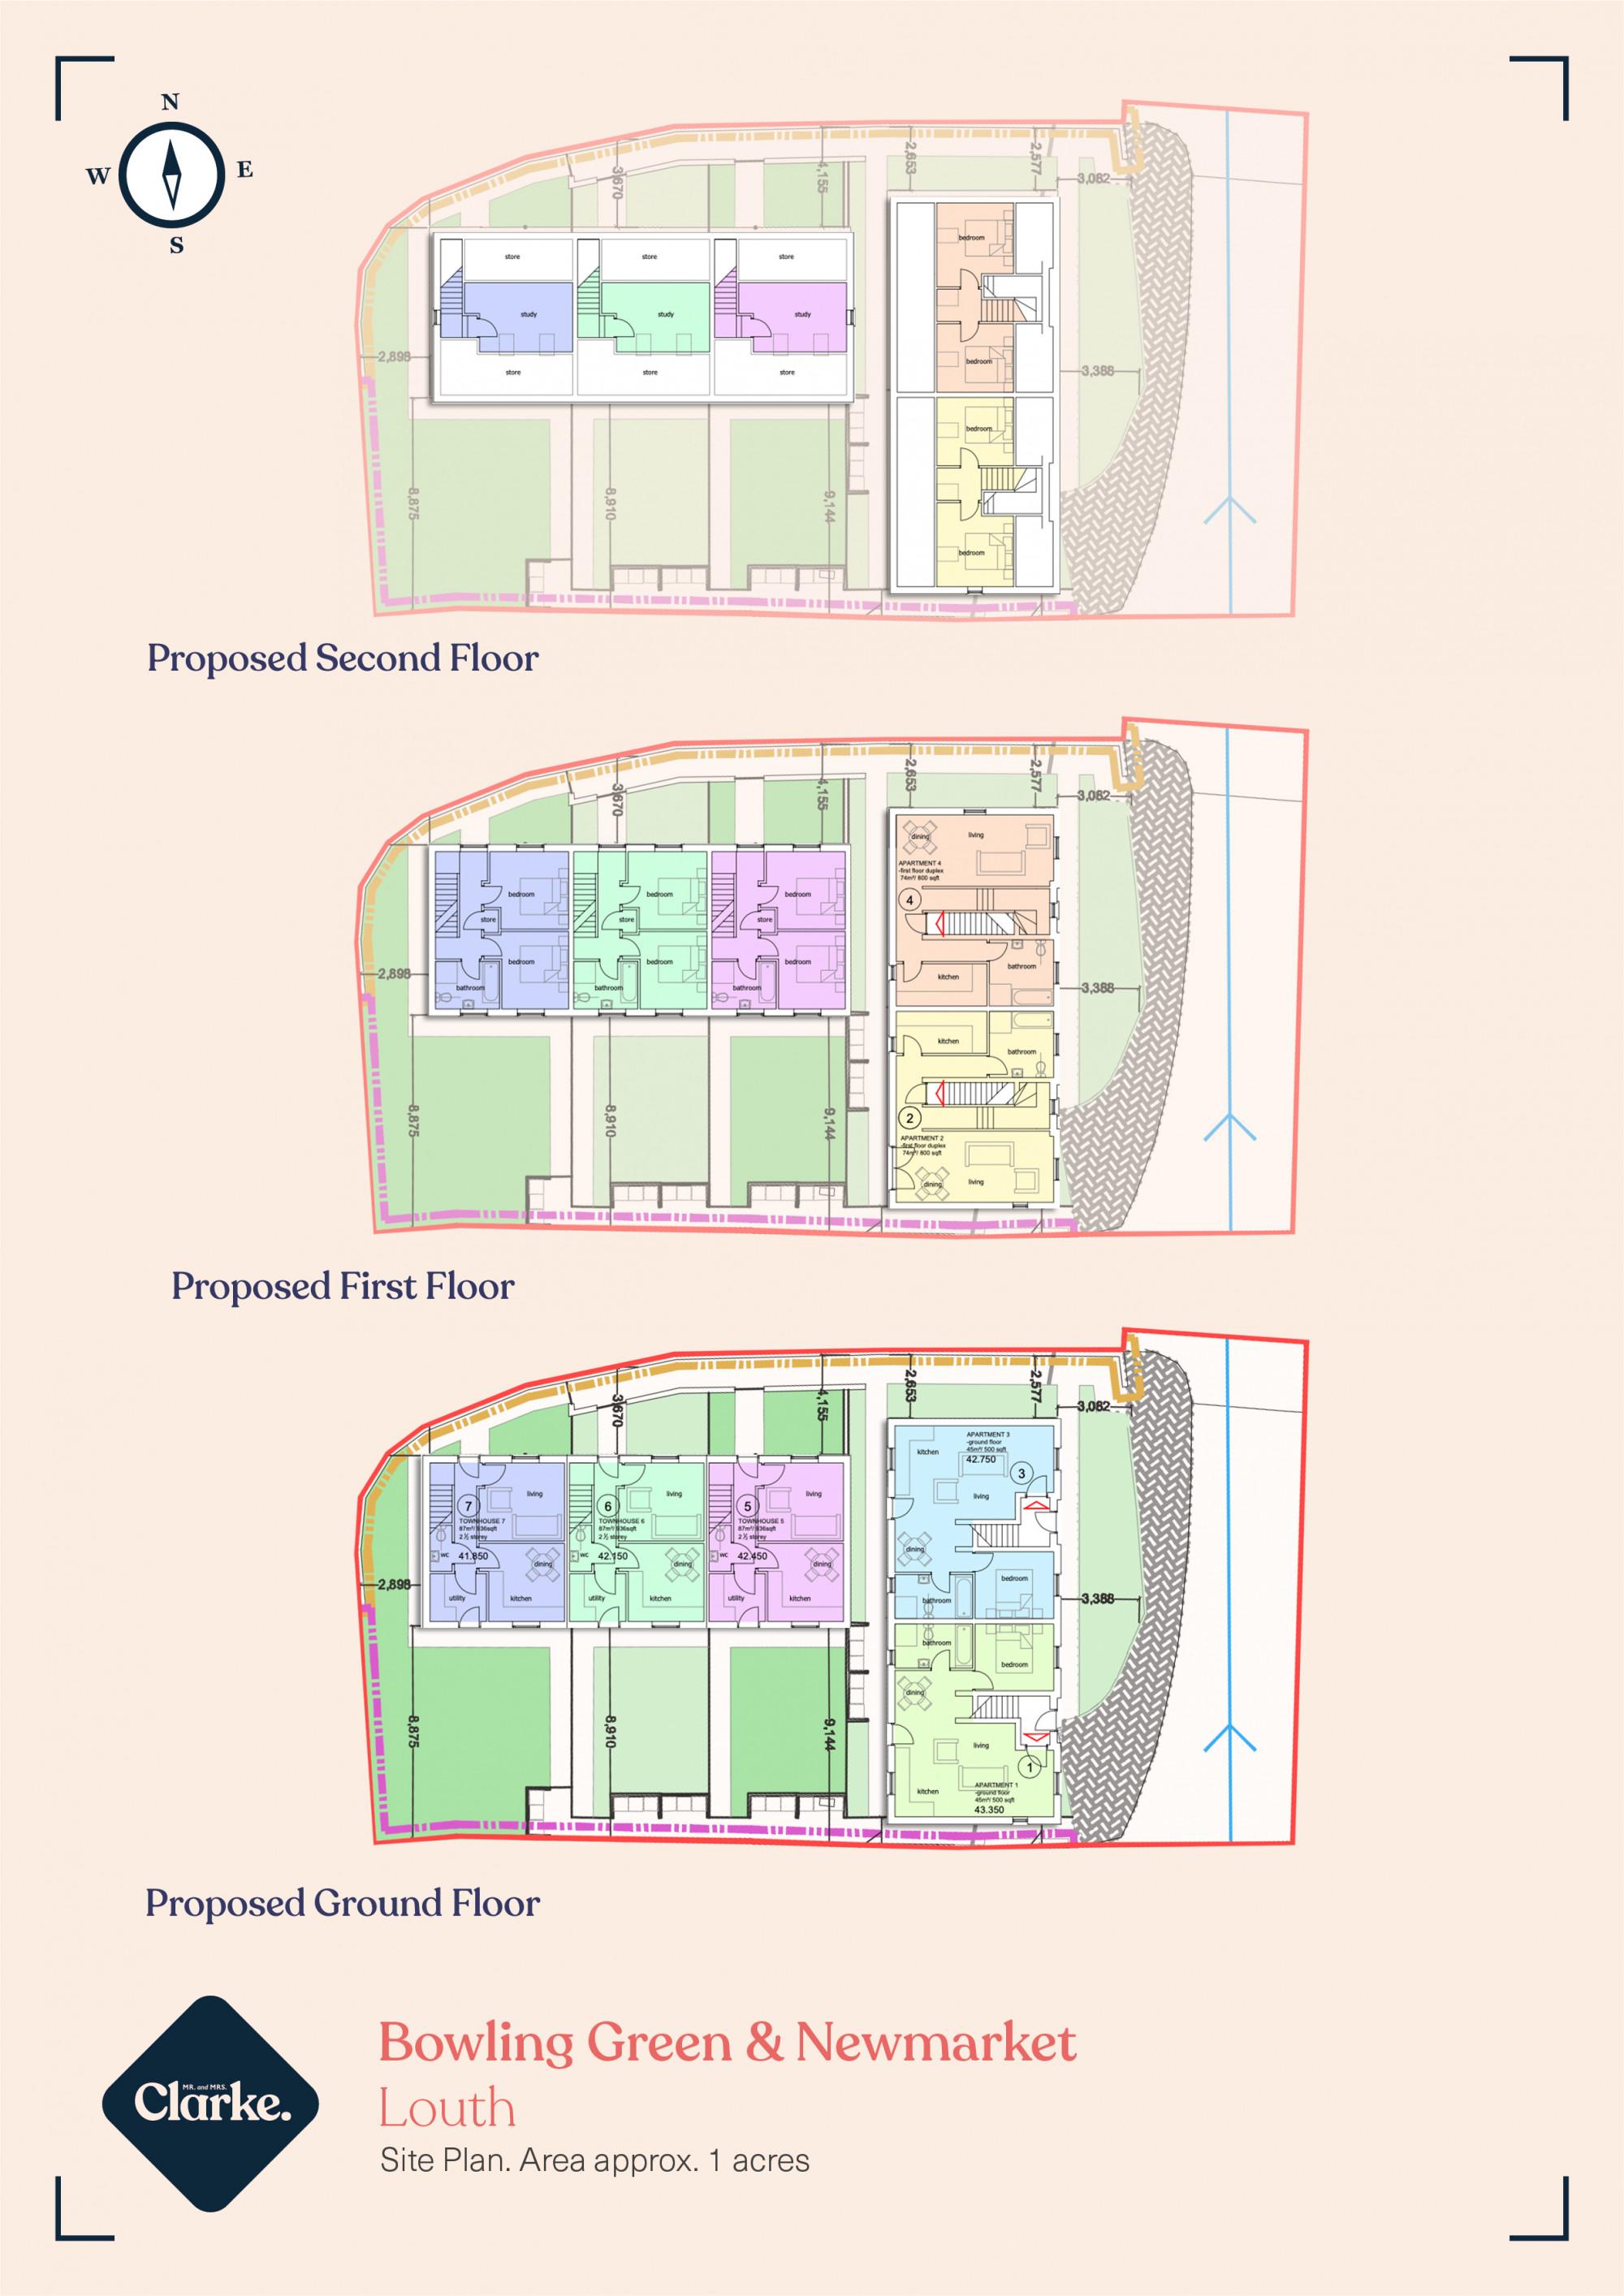 Bowling Green Lane and Newmarket Land, Louth. Floorplan.